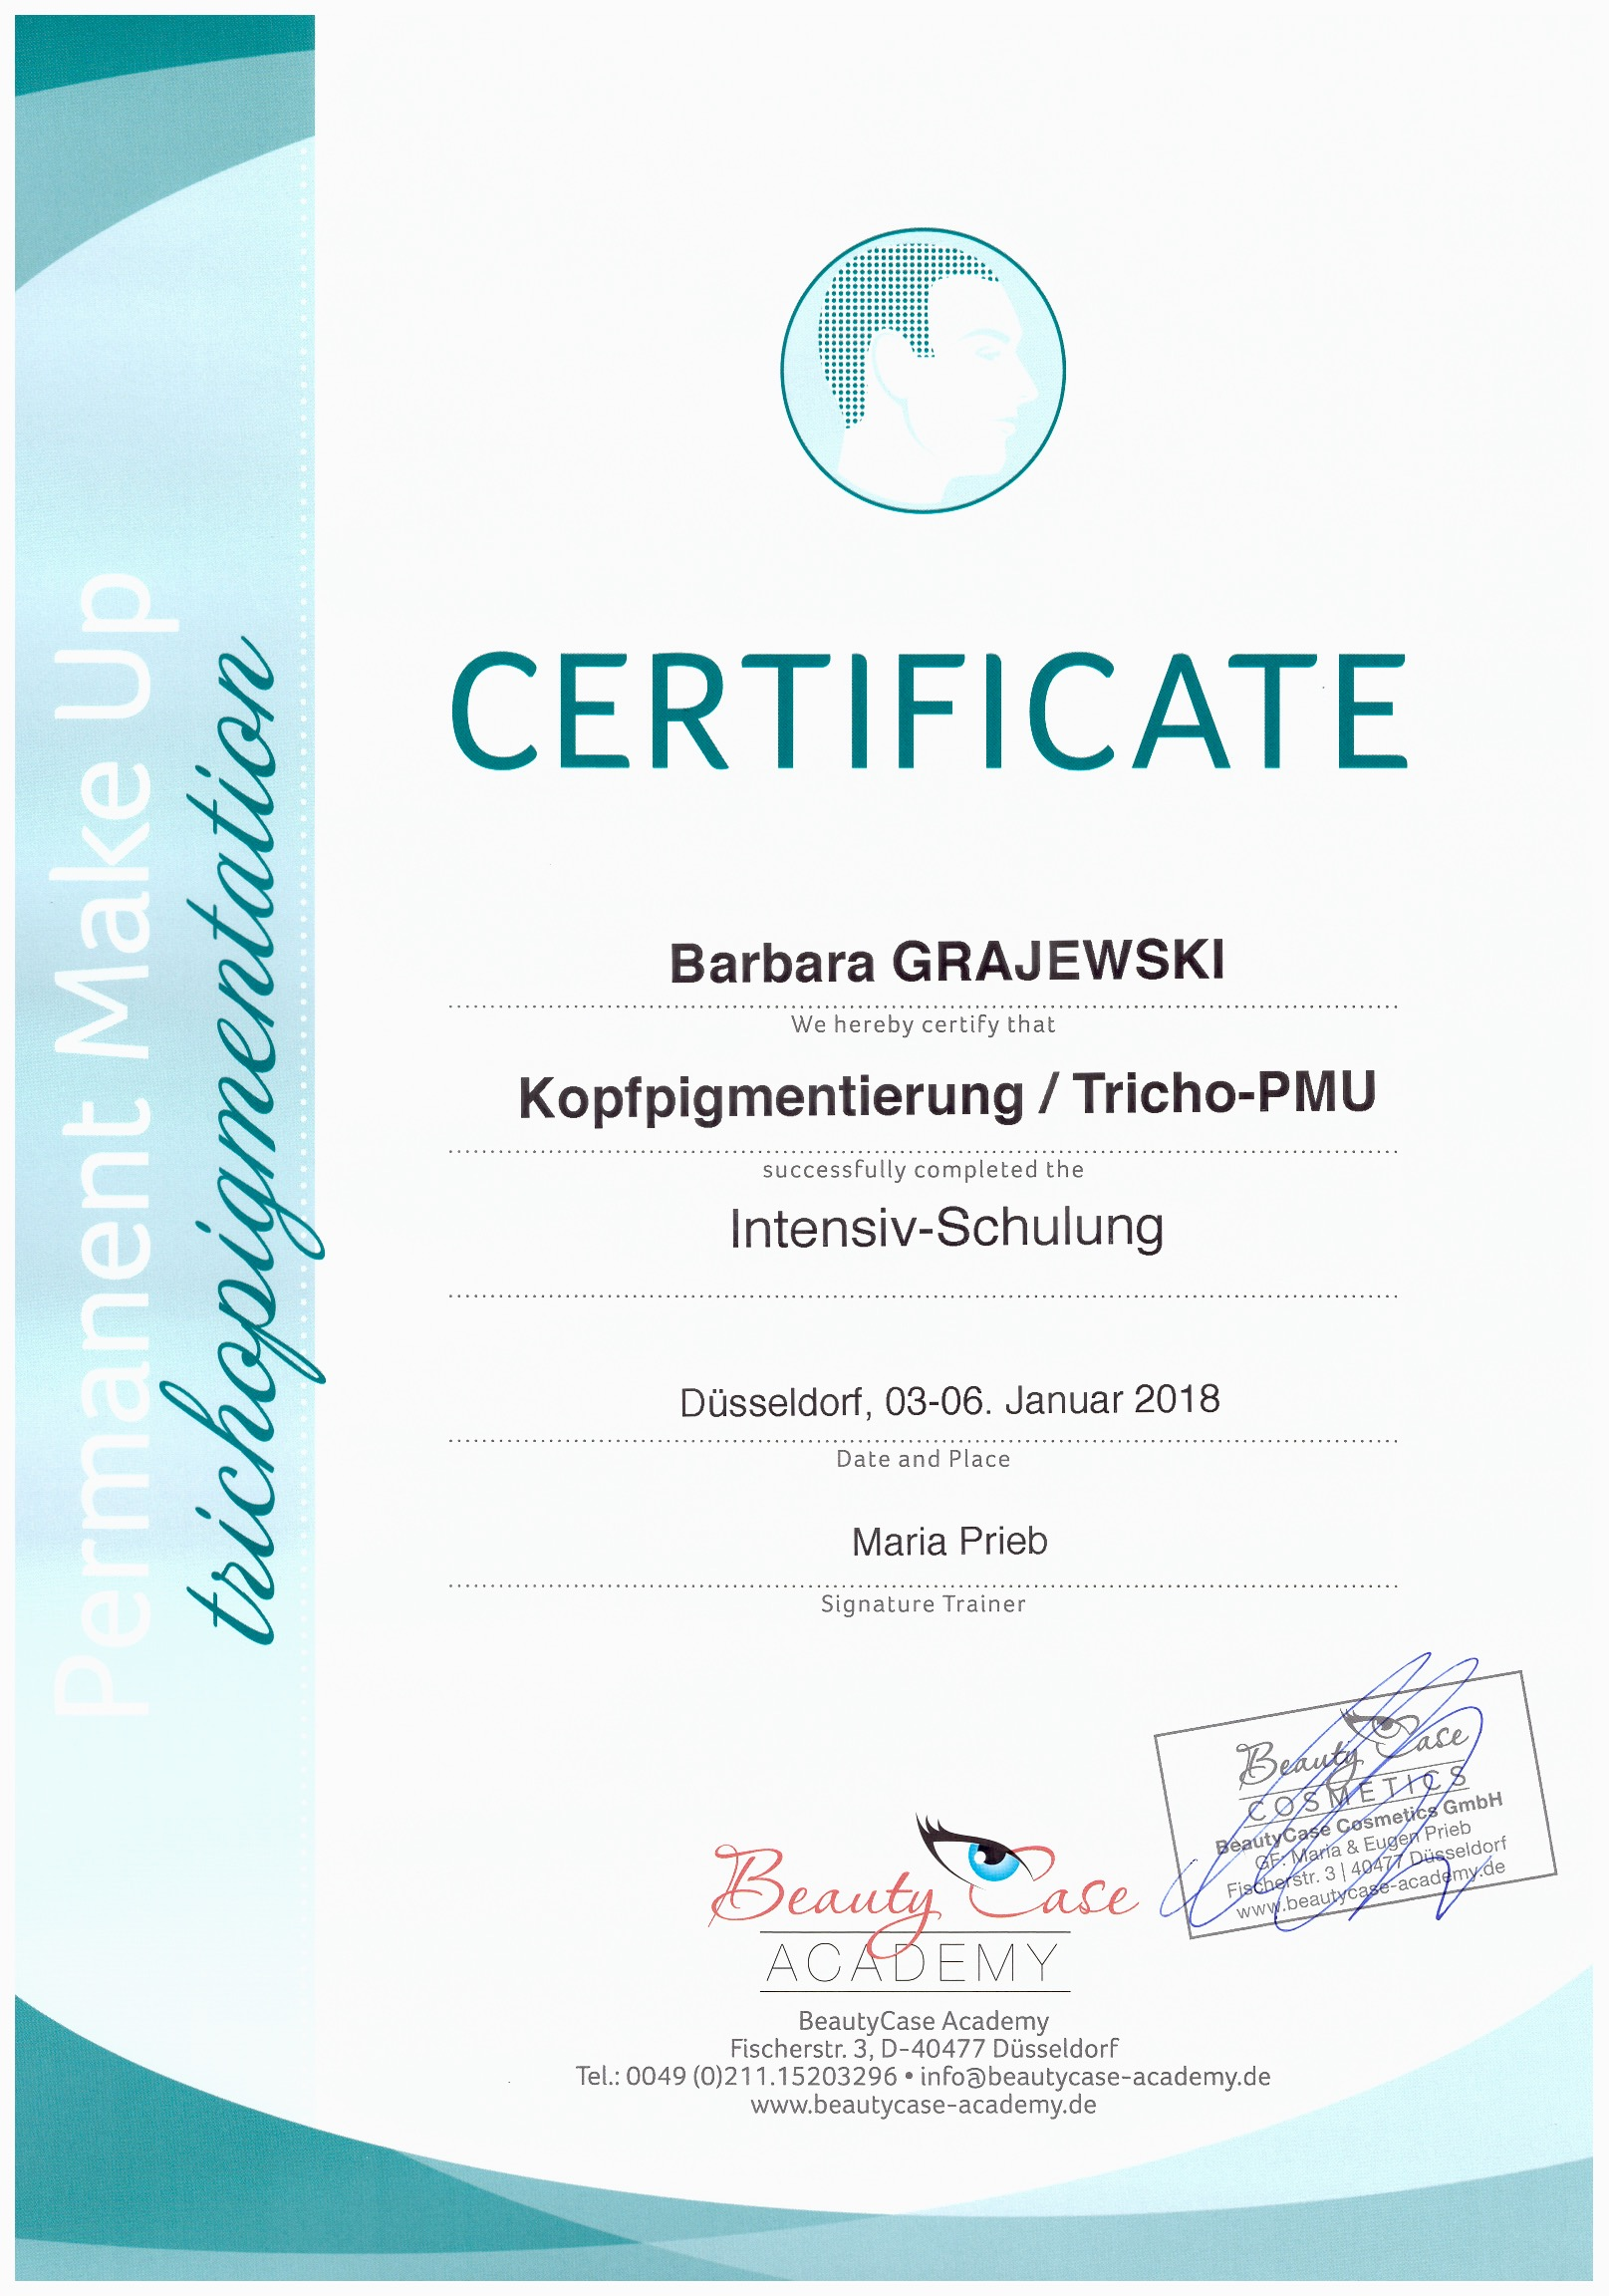 Grajewski Vip beauty studio -Trichopigme